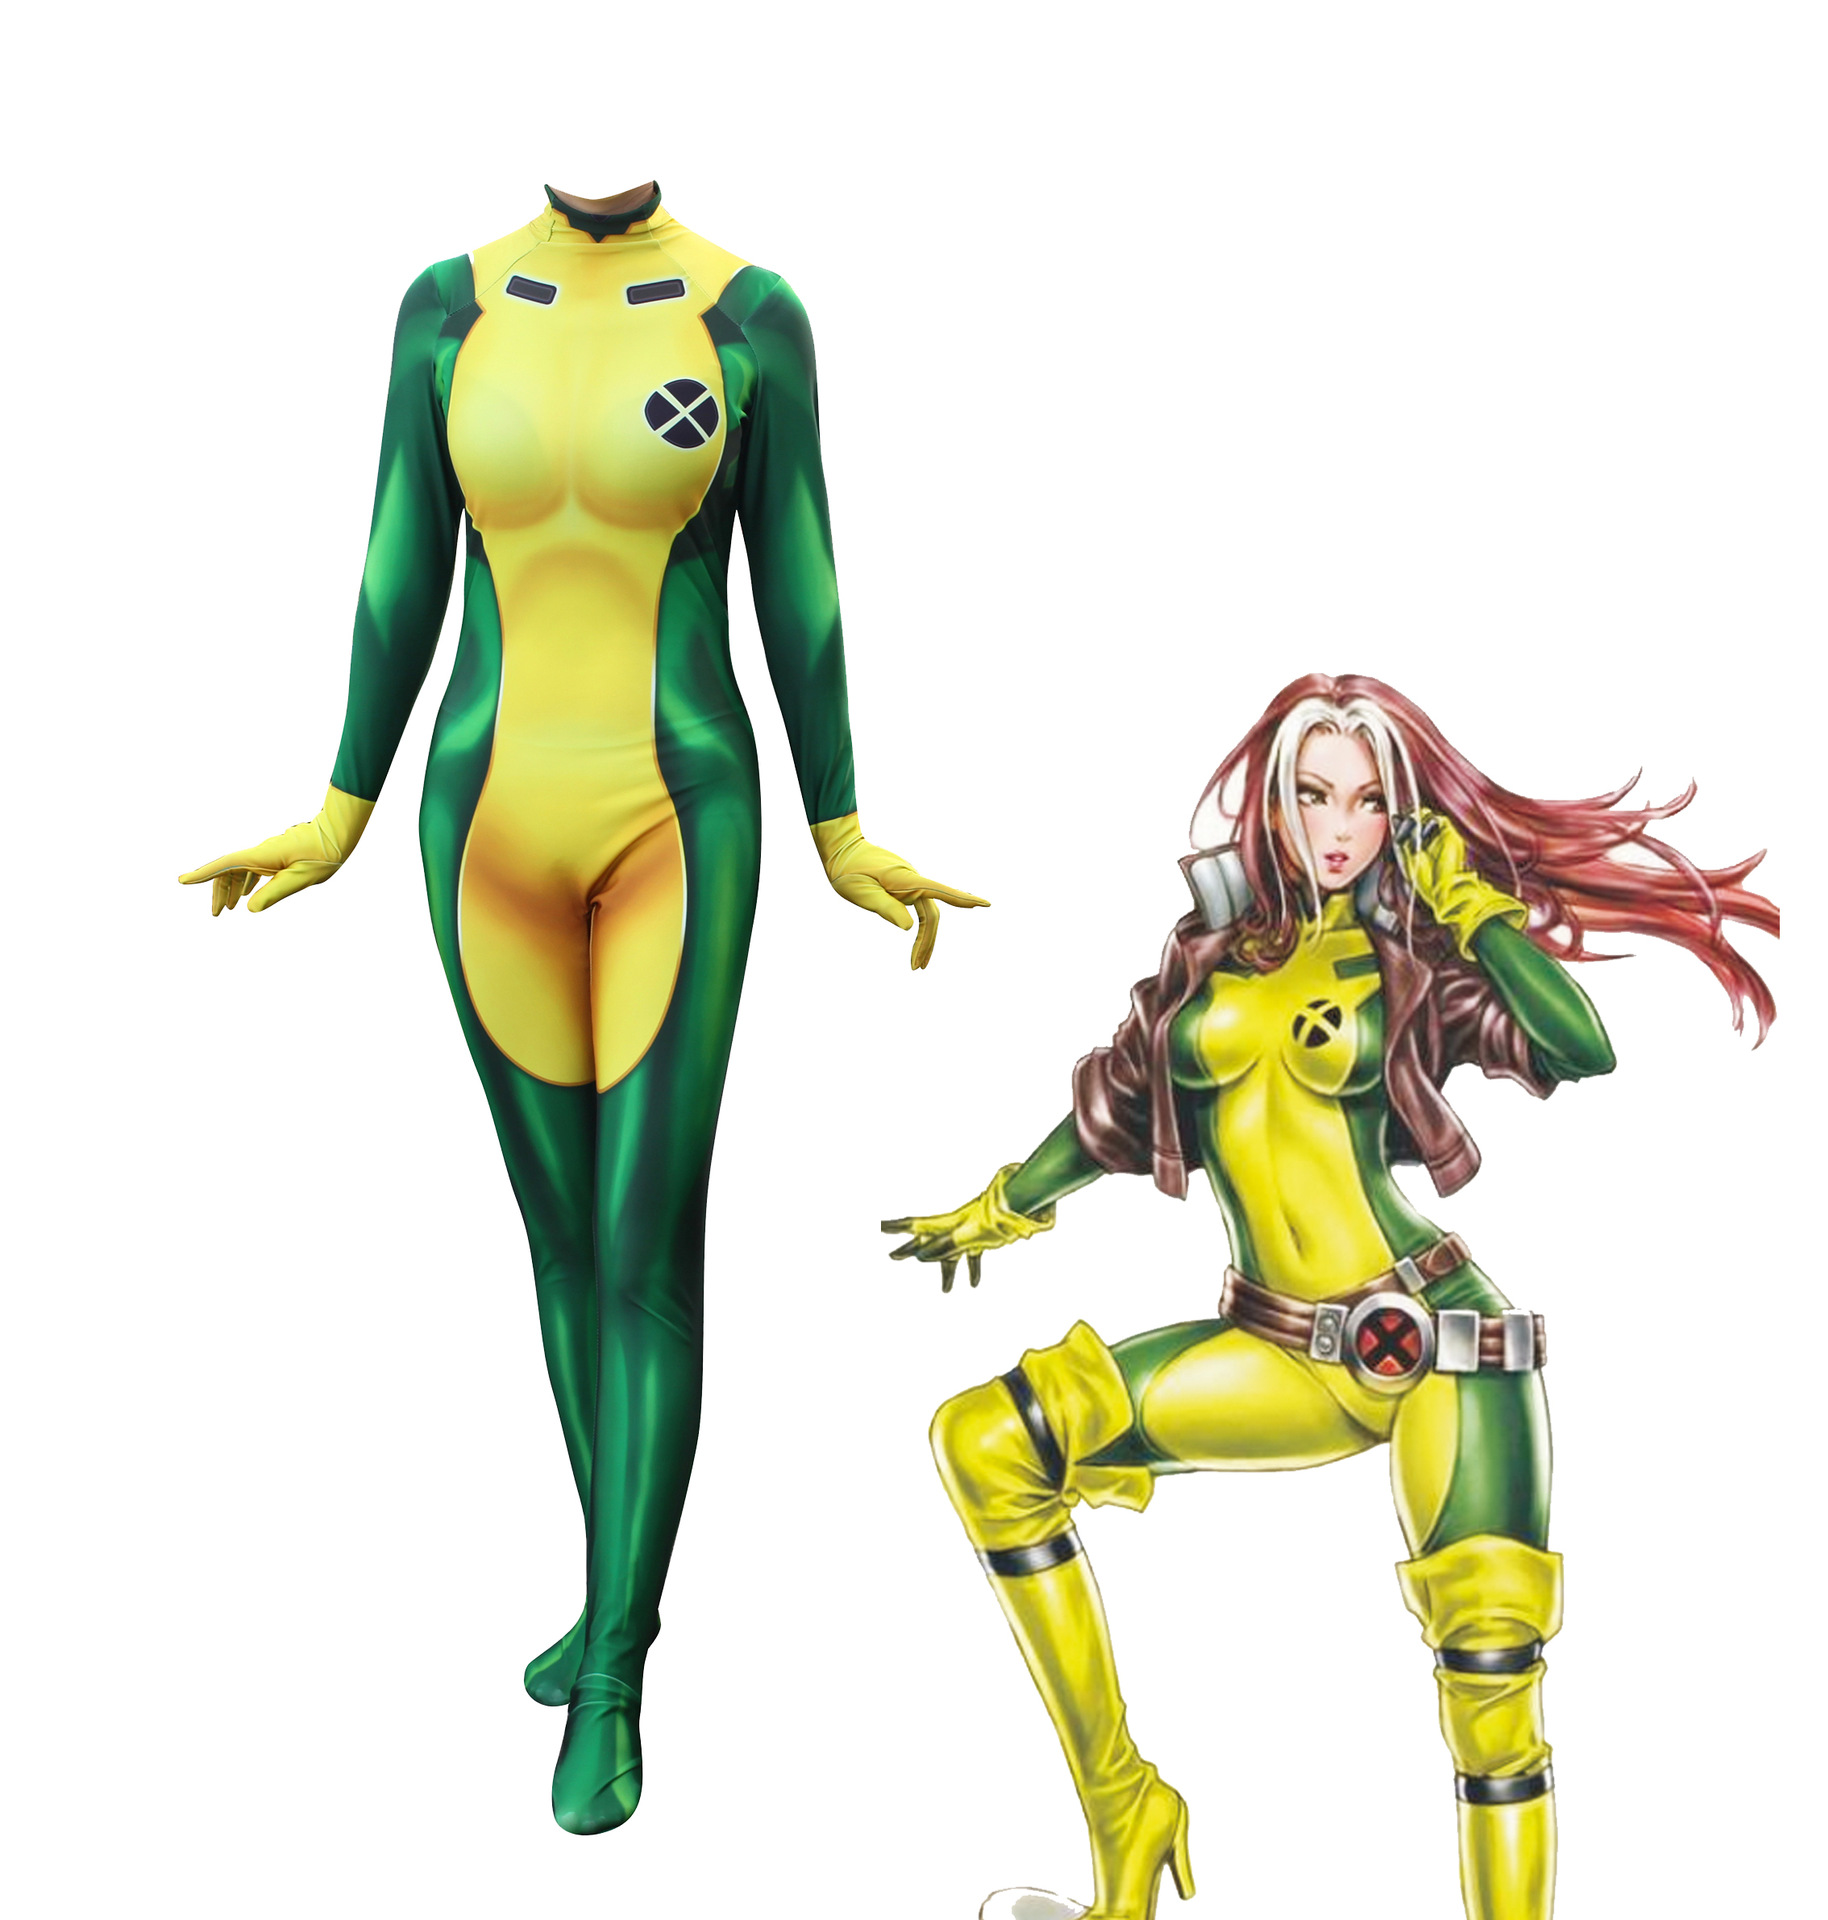 3D Printing X-Men Rogue Cosplay Costume Lycra Spandex Sexy Catsuit Zentai Woman/Girls/Lady Superhero Halloween Xmen Costumes